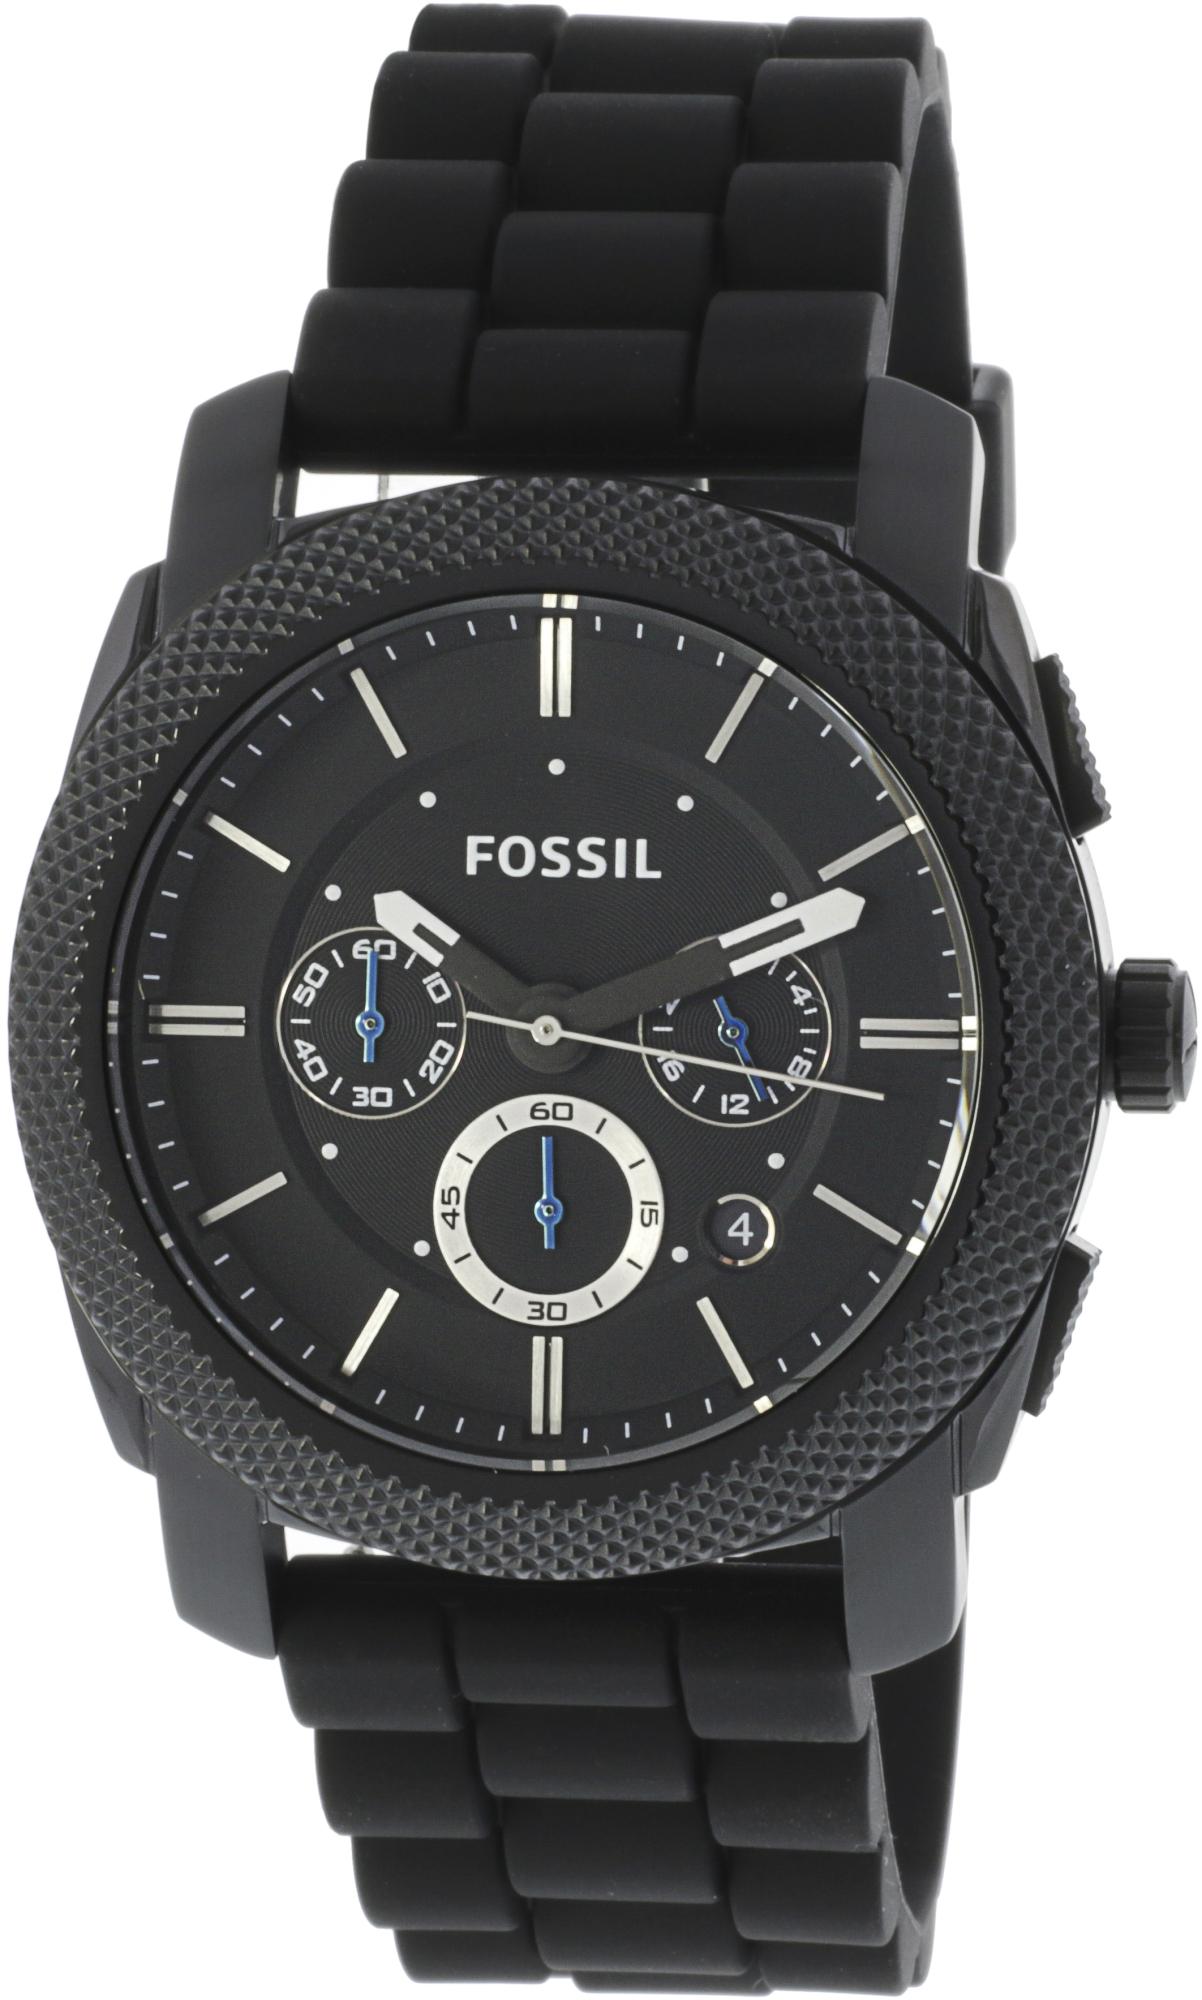 Fossil_Mens_Machine_FS4487_Black_Silicone_Analog_Quartz_Fashion_Watch